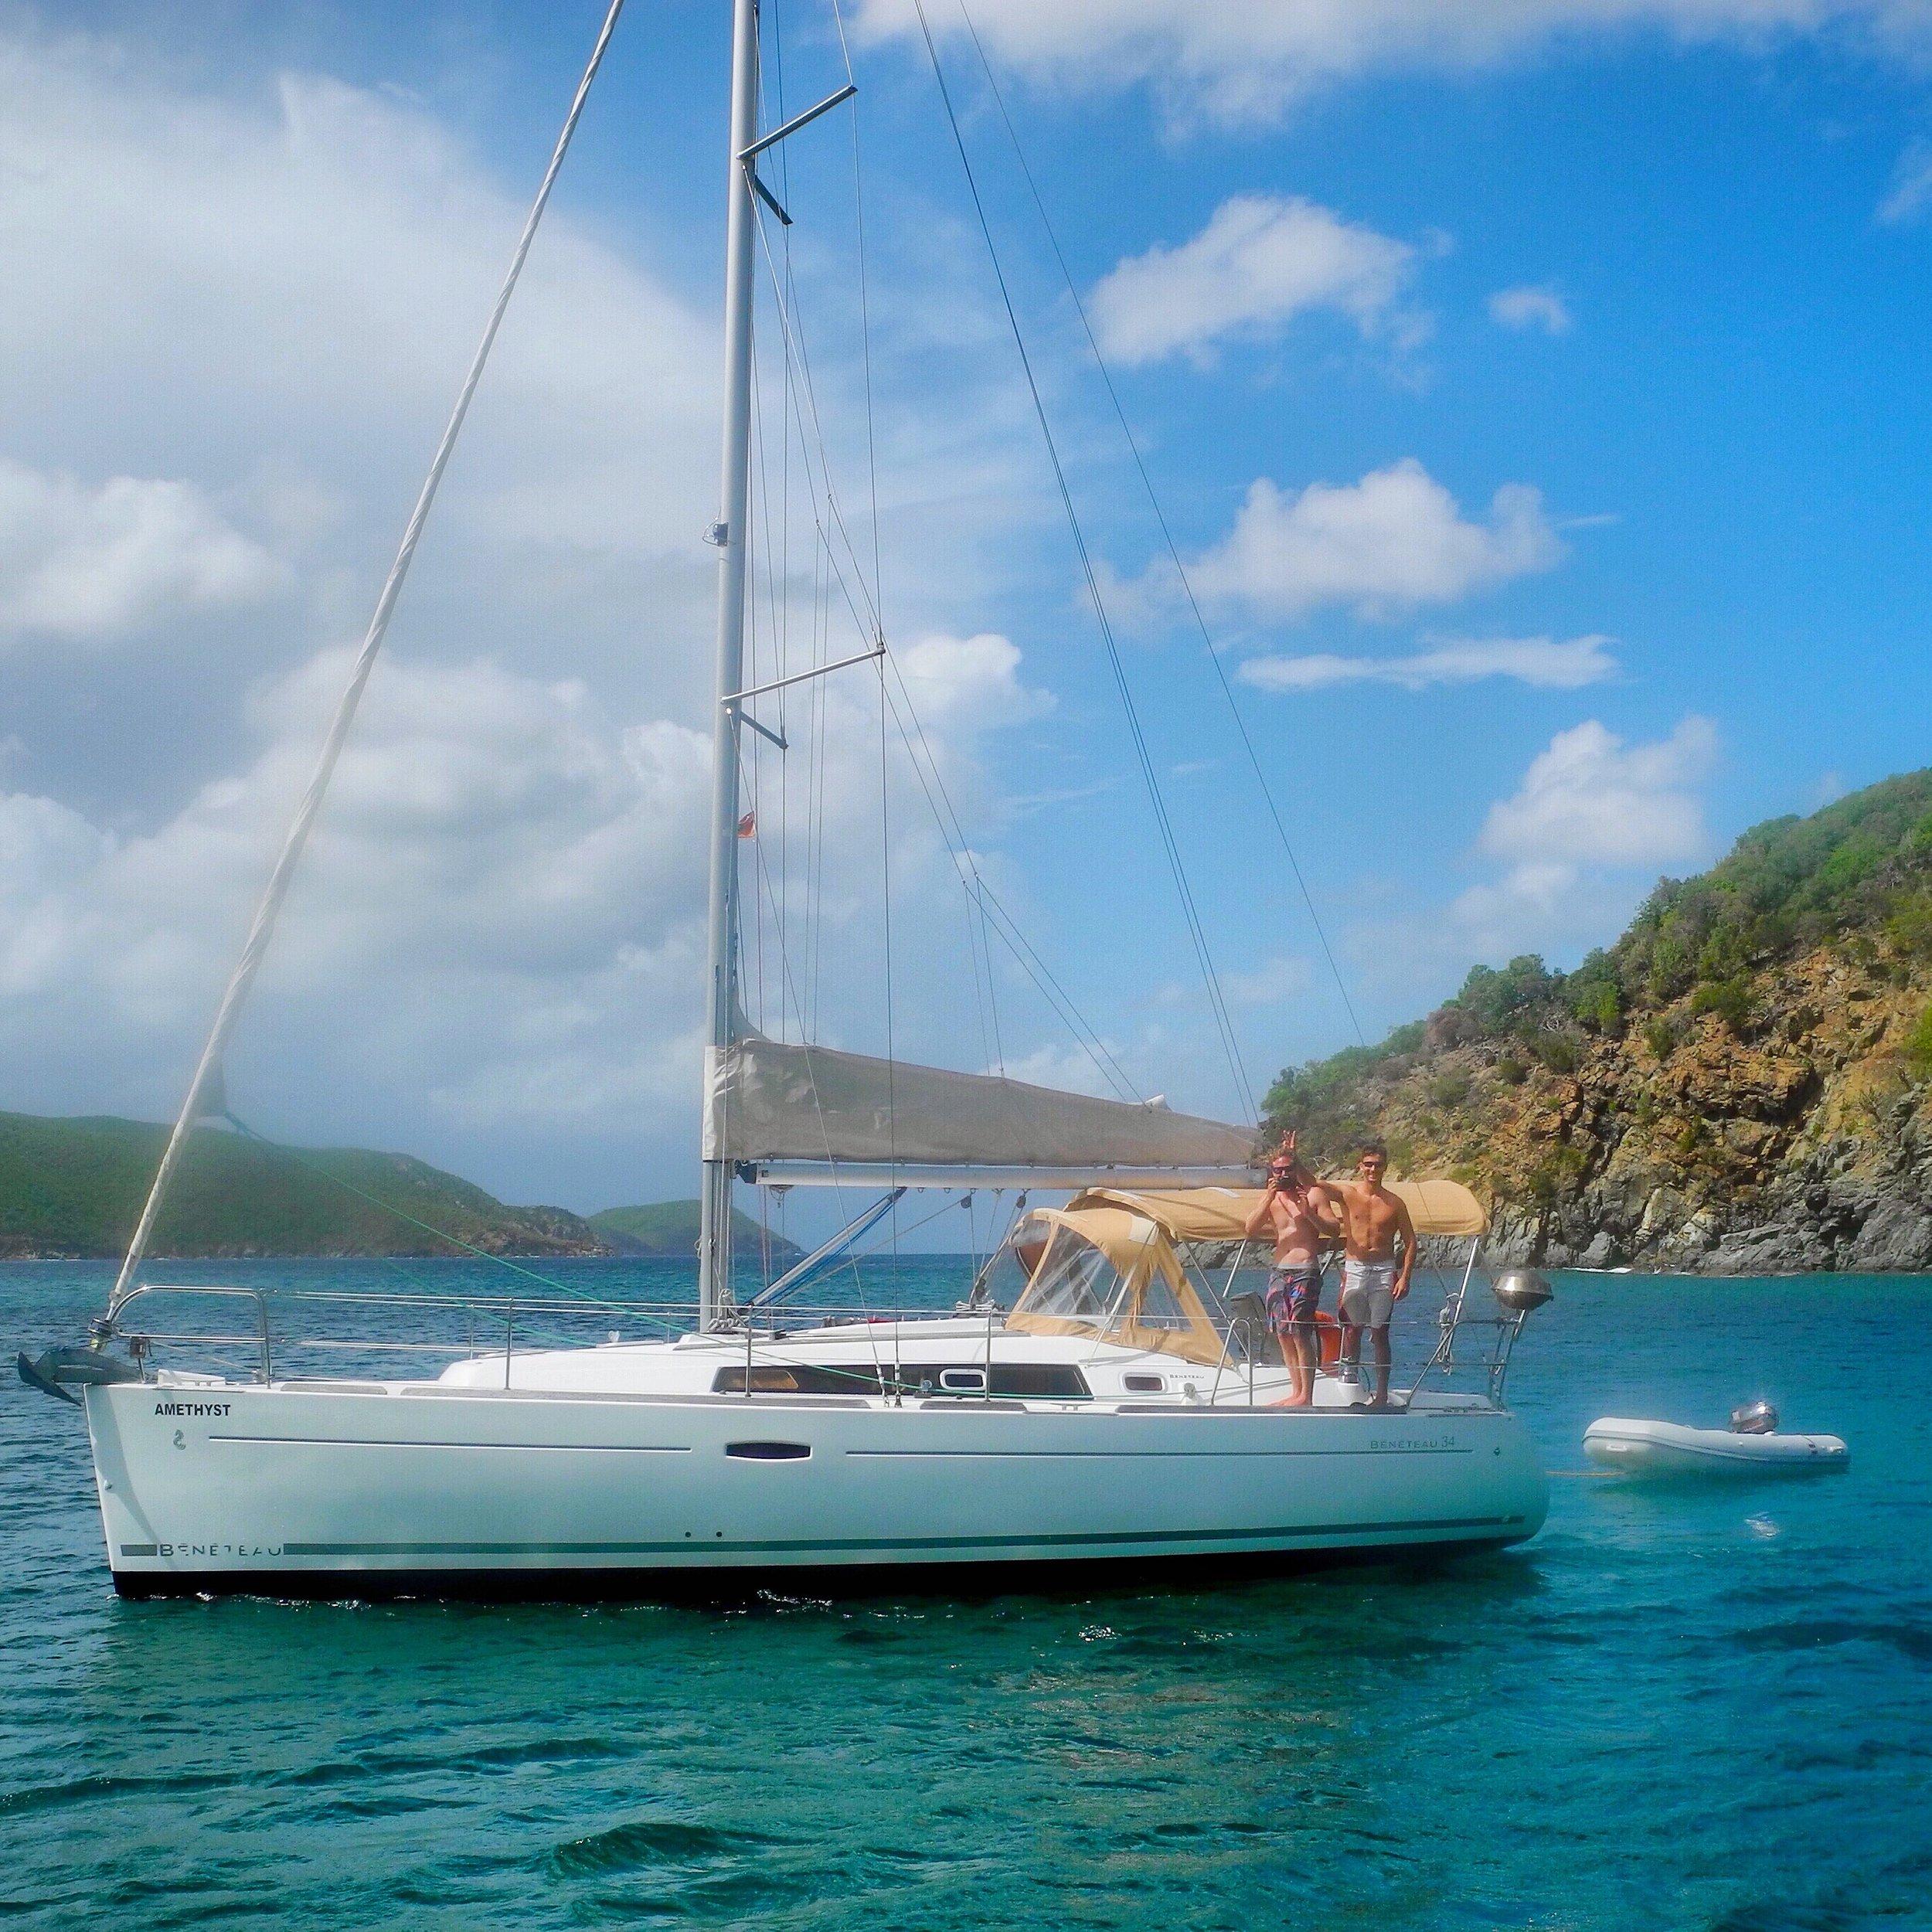 Our boat, a Beneteau 34